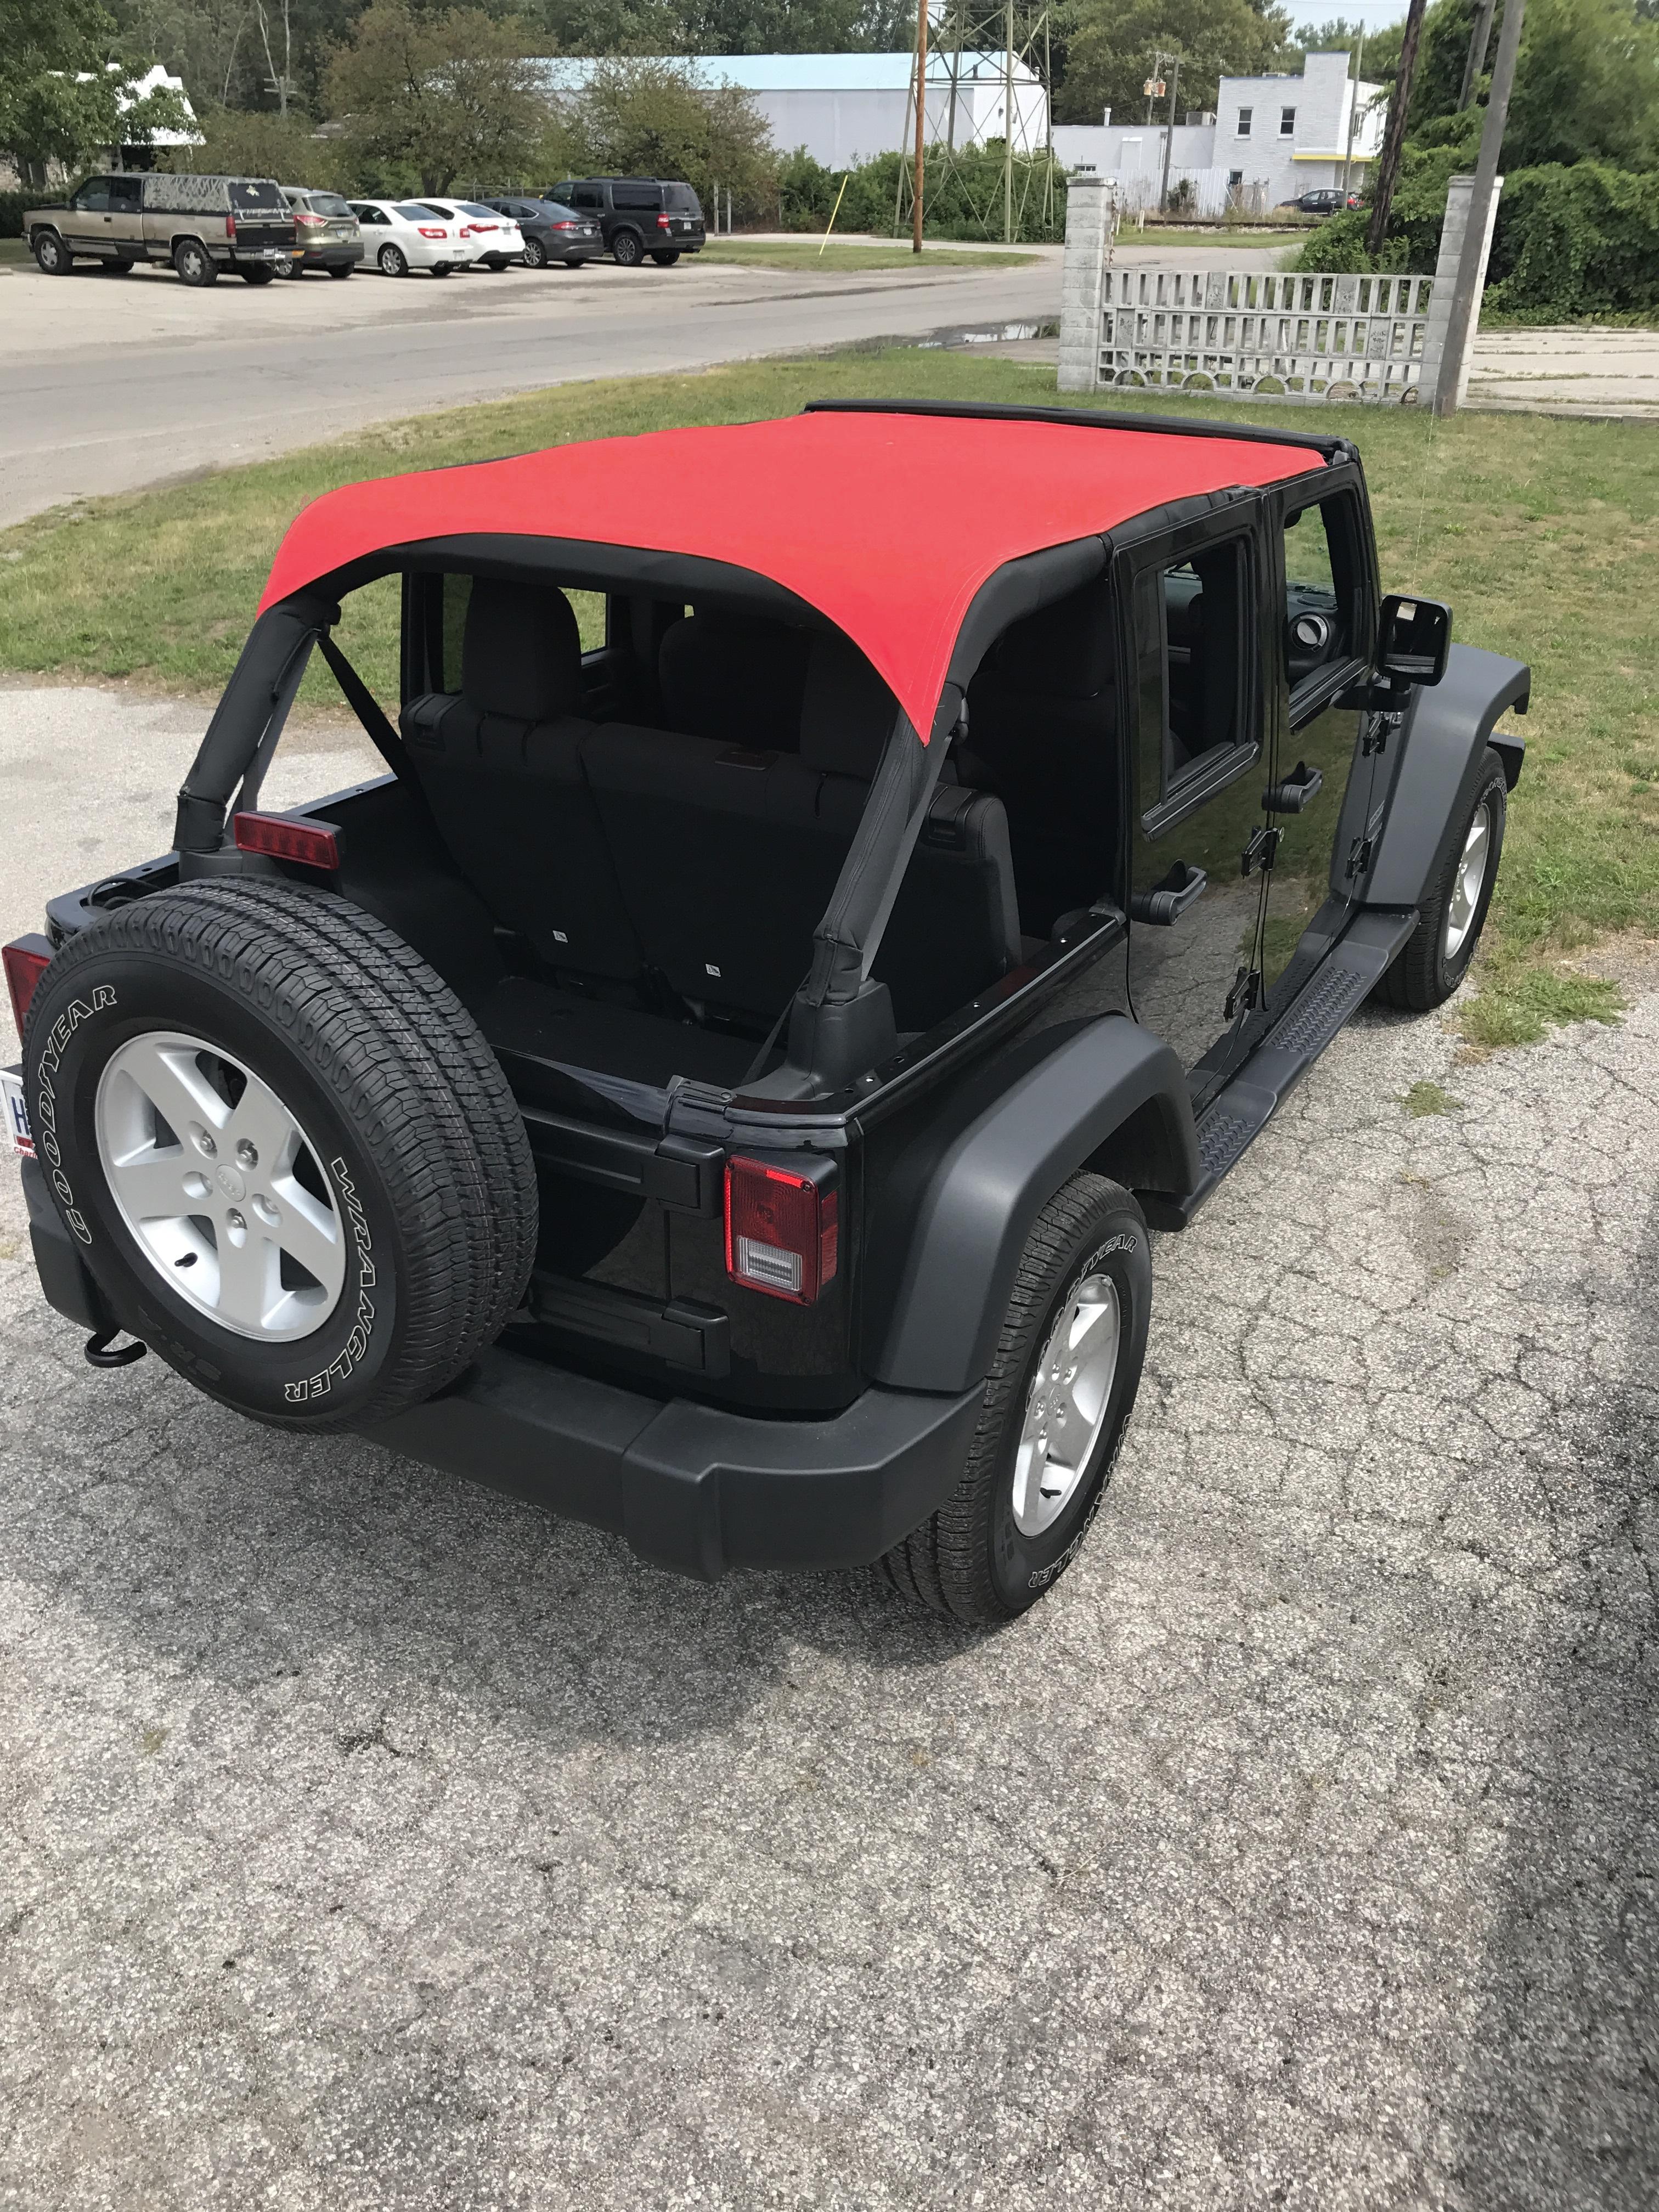 Jeep Wrangler Sun Top – Sunbrella Fabric